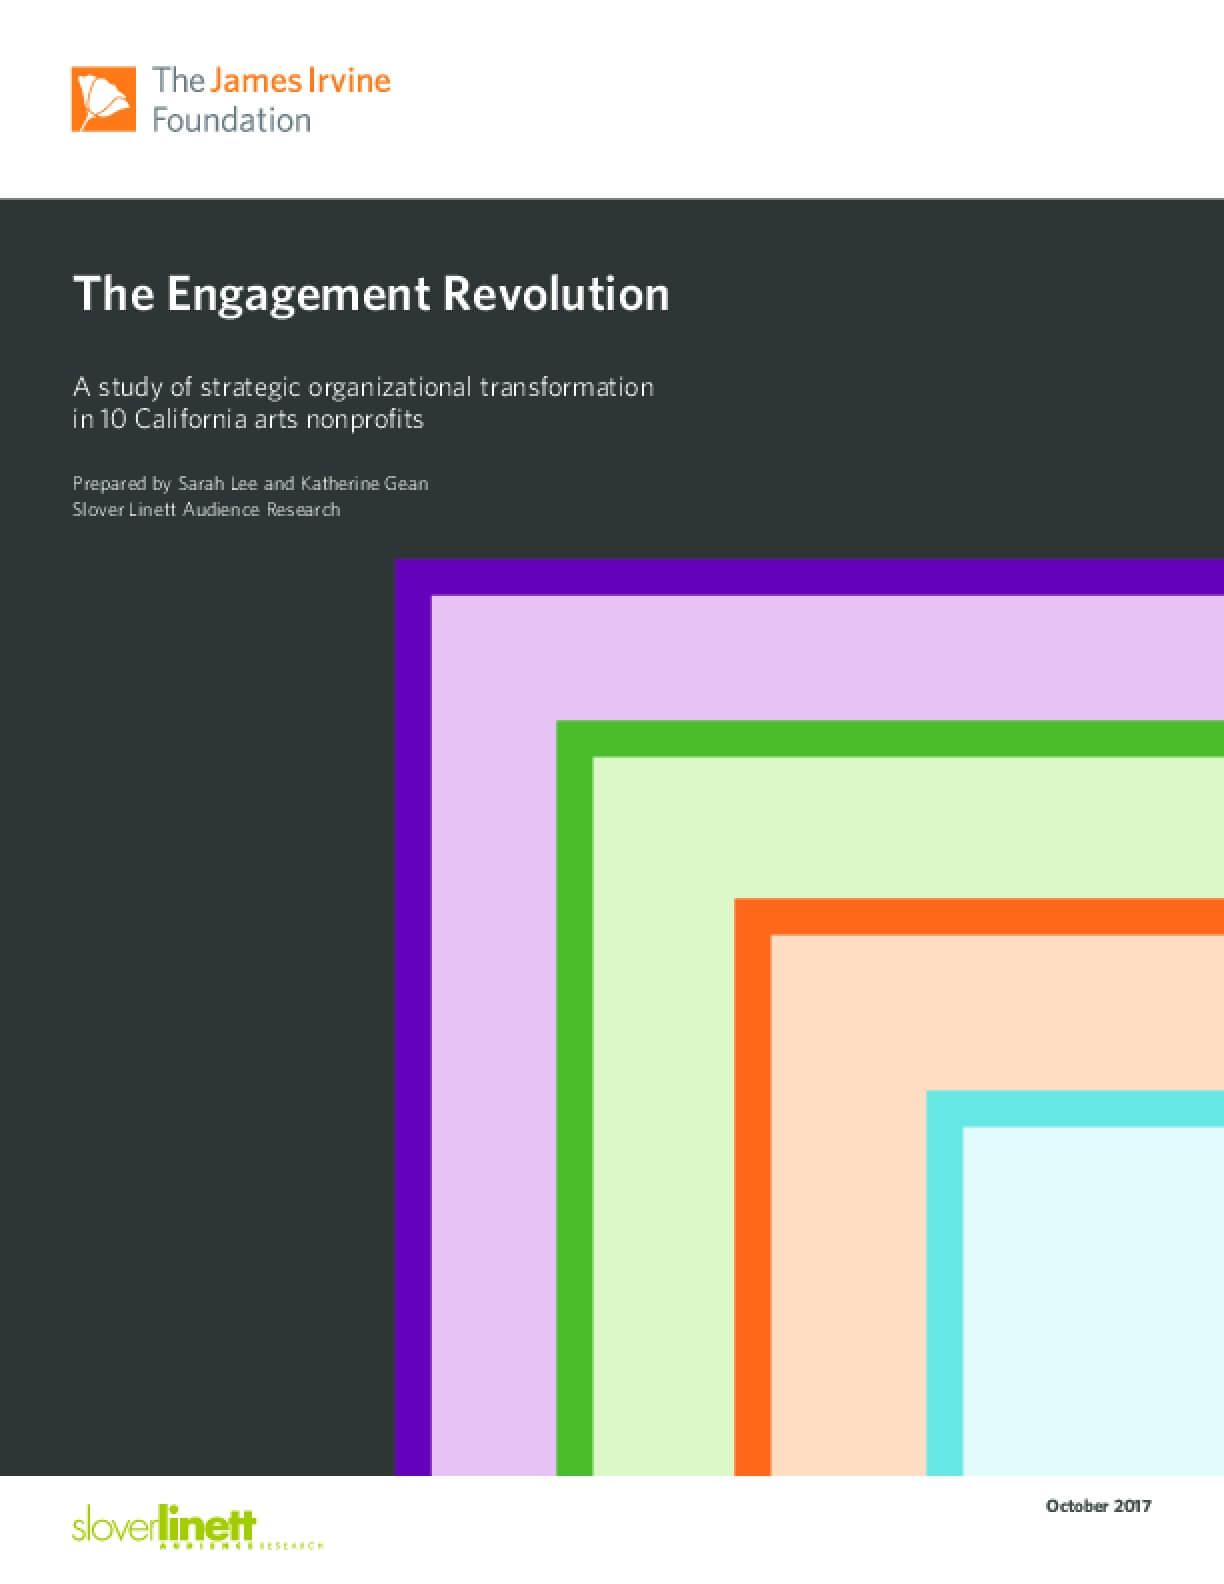 The Engagement Revolution: A Study of Strategic Organizational Transformation in 10 California Arts Nonprofits